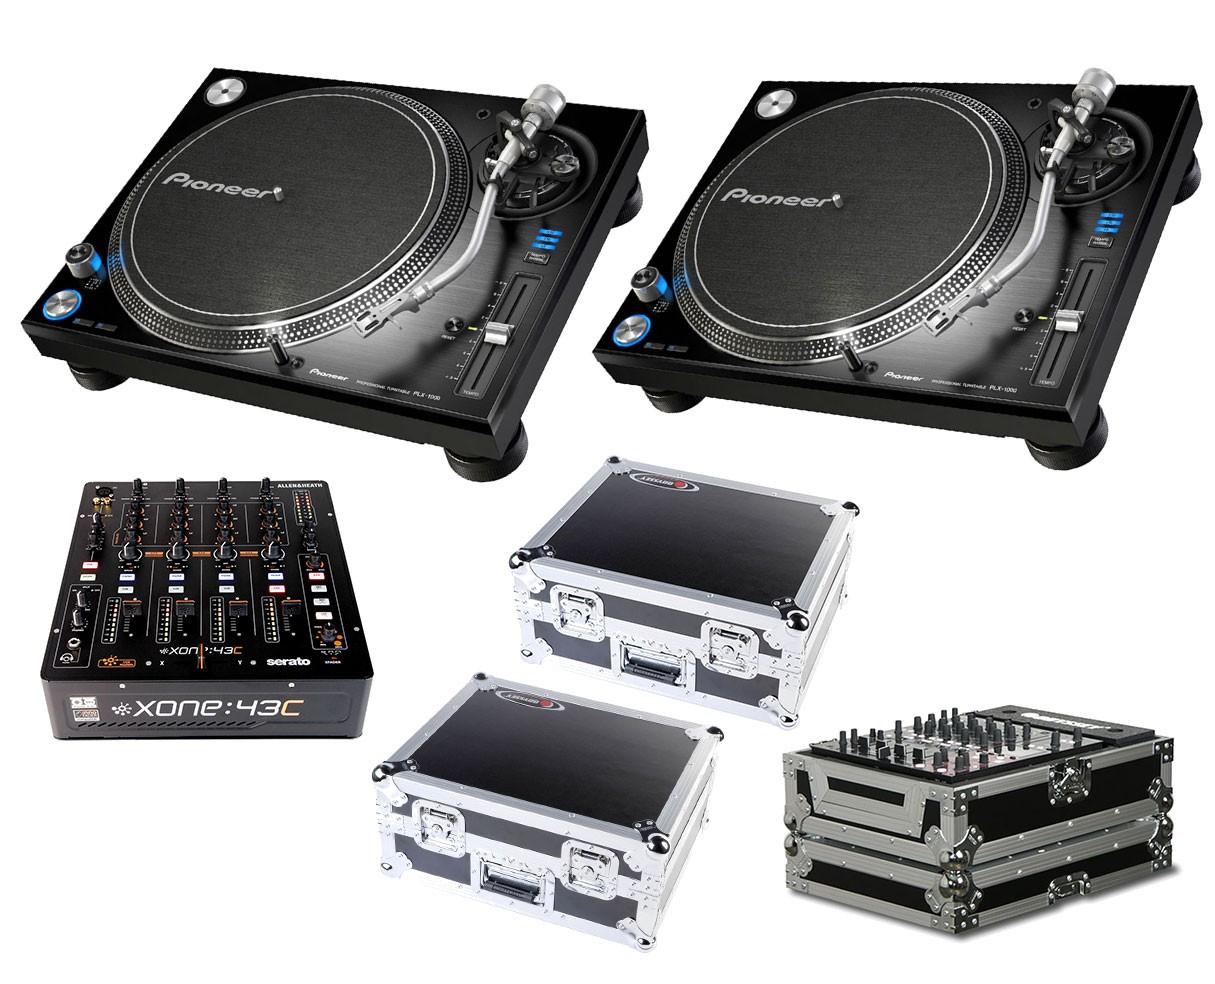 2x Pioneer PLX-1000 + Xone:43C + Odyssey Cases